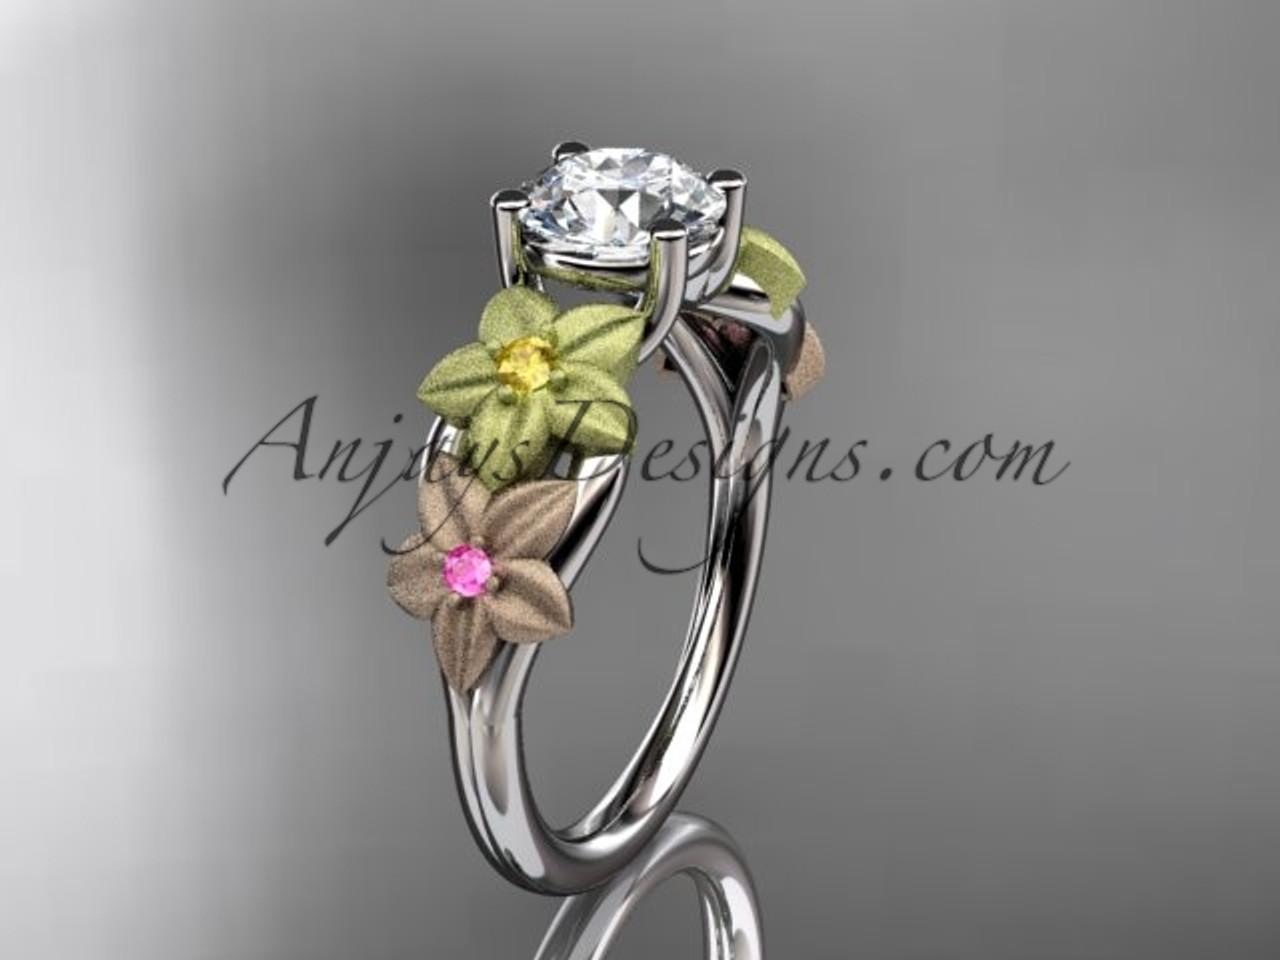 14kt tri color gold floral unique engagement ring wedding ring ADLR169